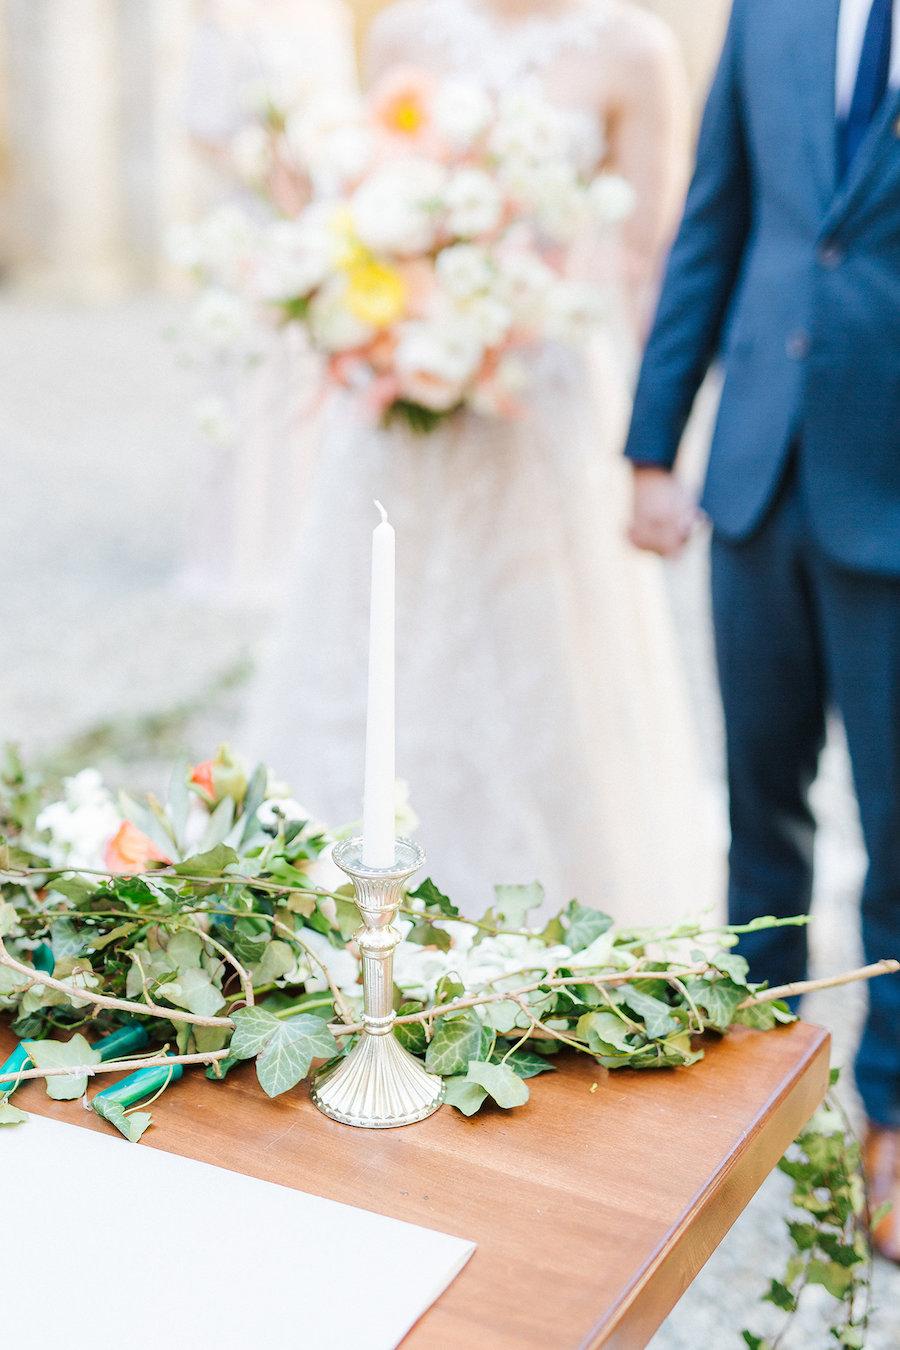 allestimento cerimonia con candele ed edera